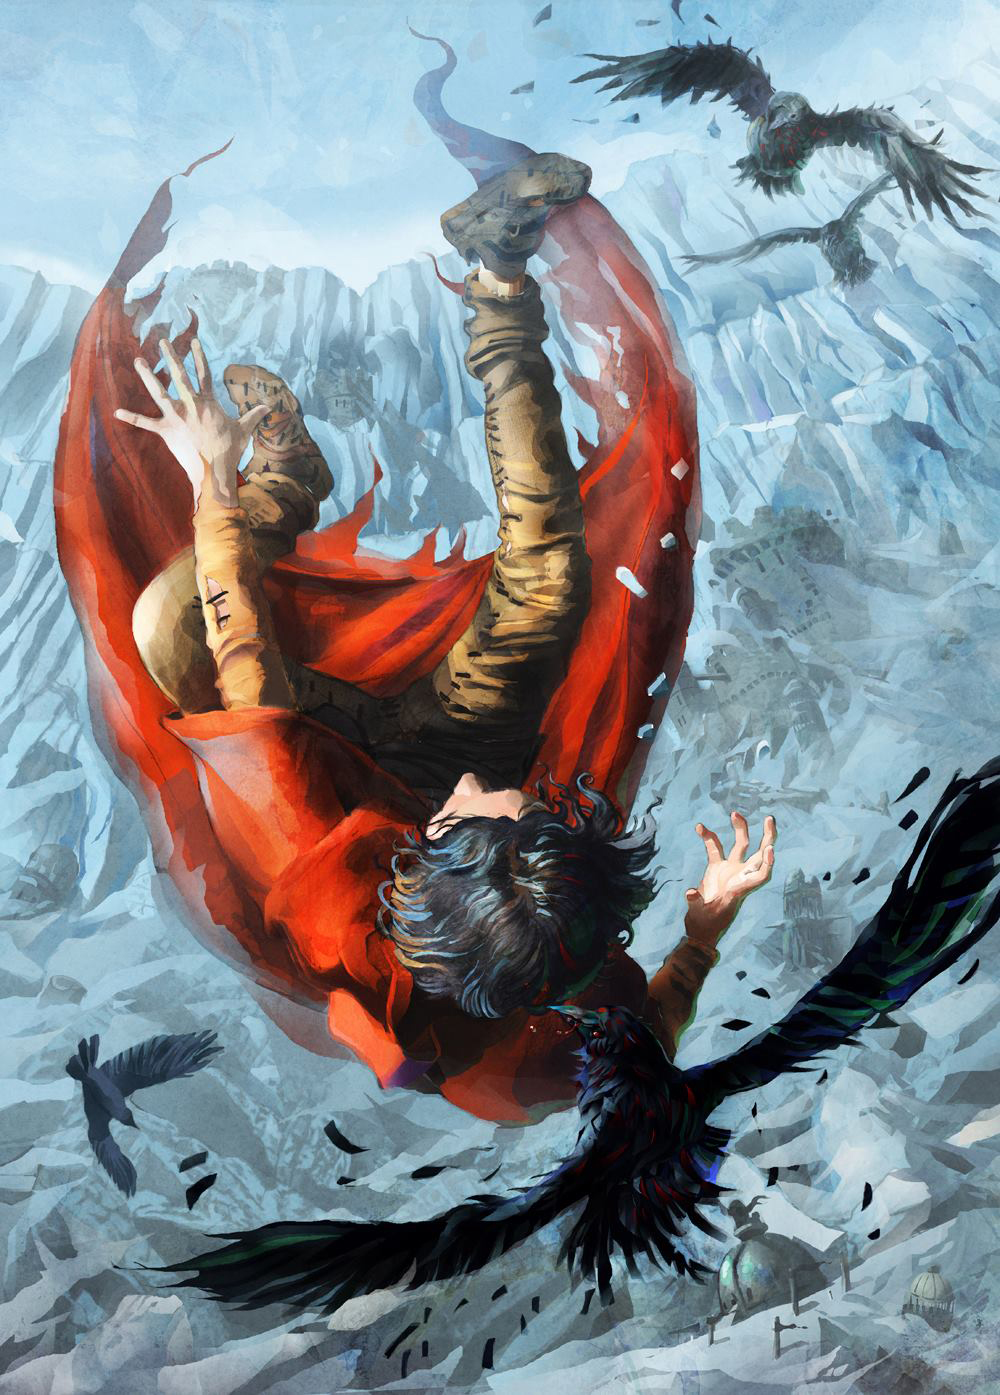 Ken McCuen, A Game of Thrones